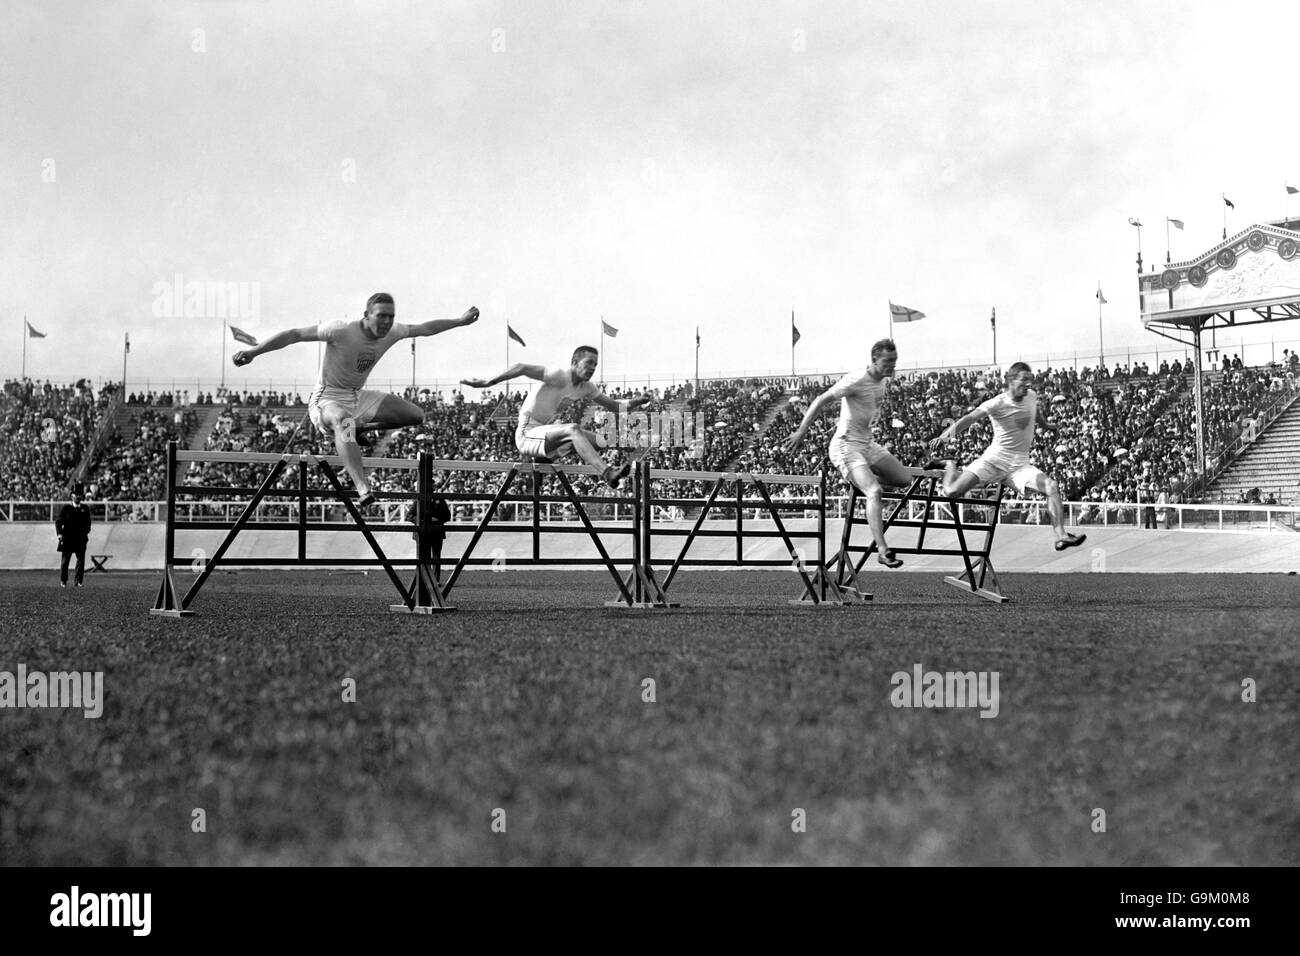 Athletics - London Olympic Games 1908 - 110m Hurdles - Final - White City - Stock Image